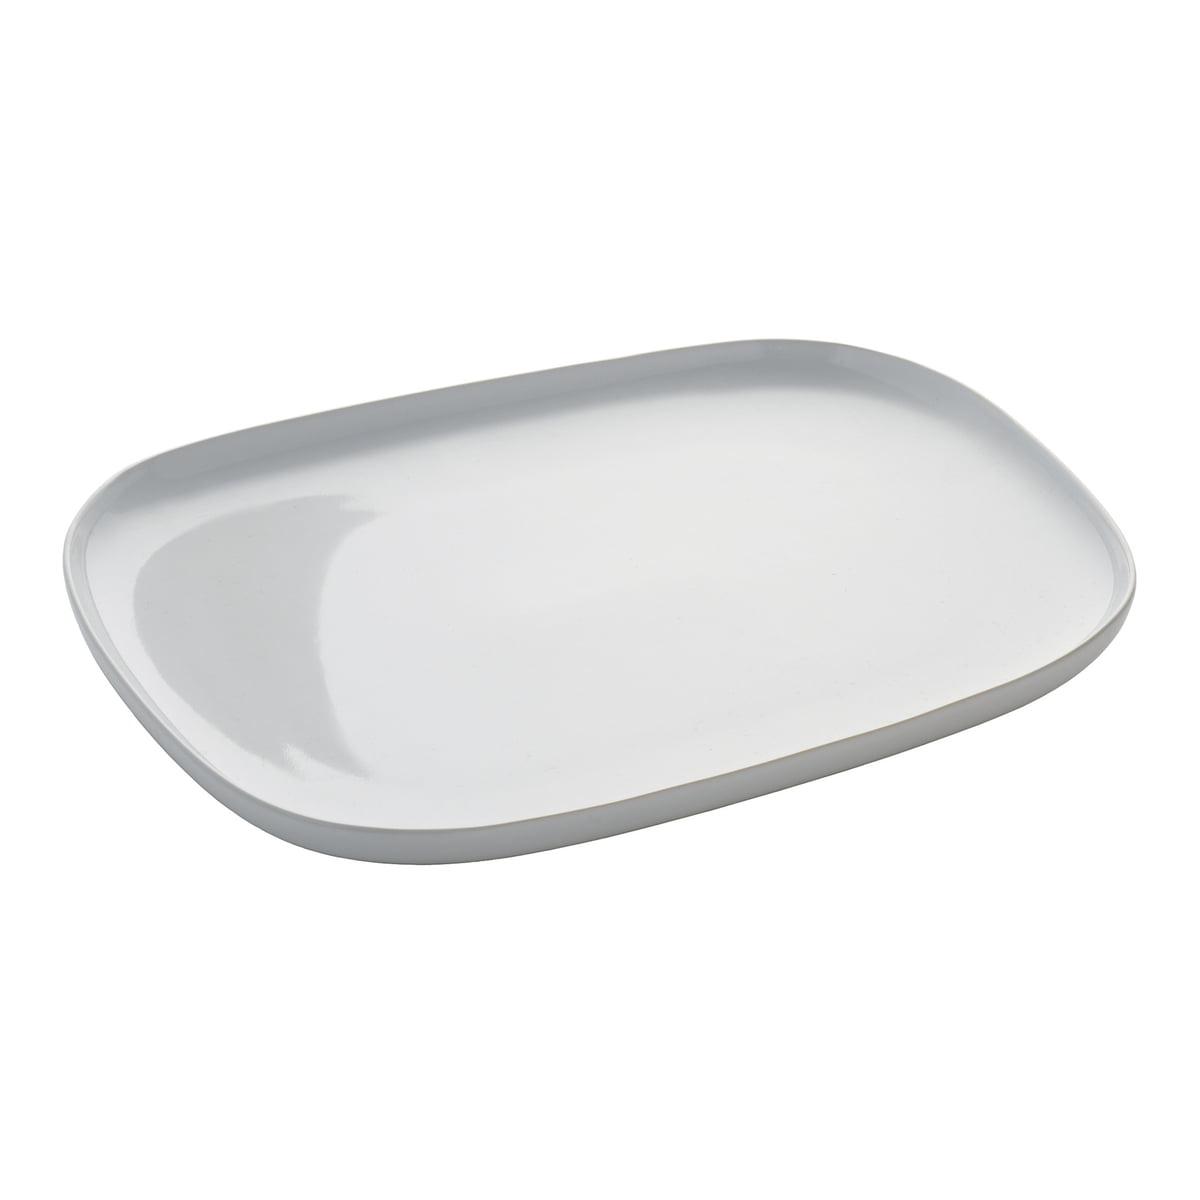 Alessi - Assiette Ovale